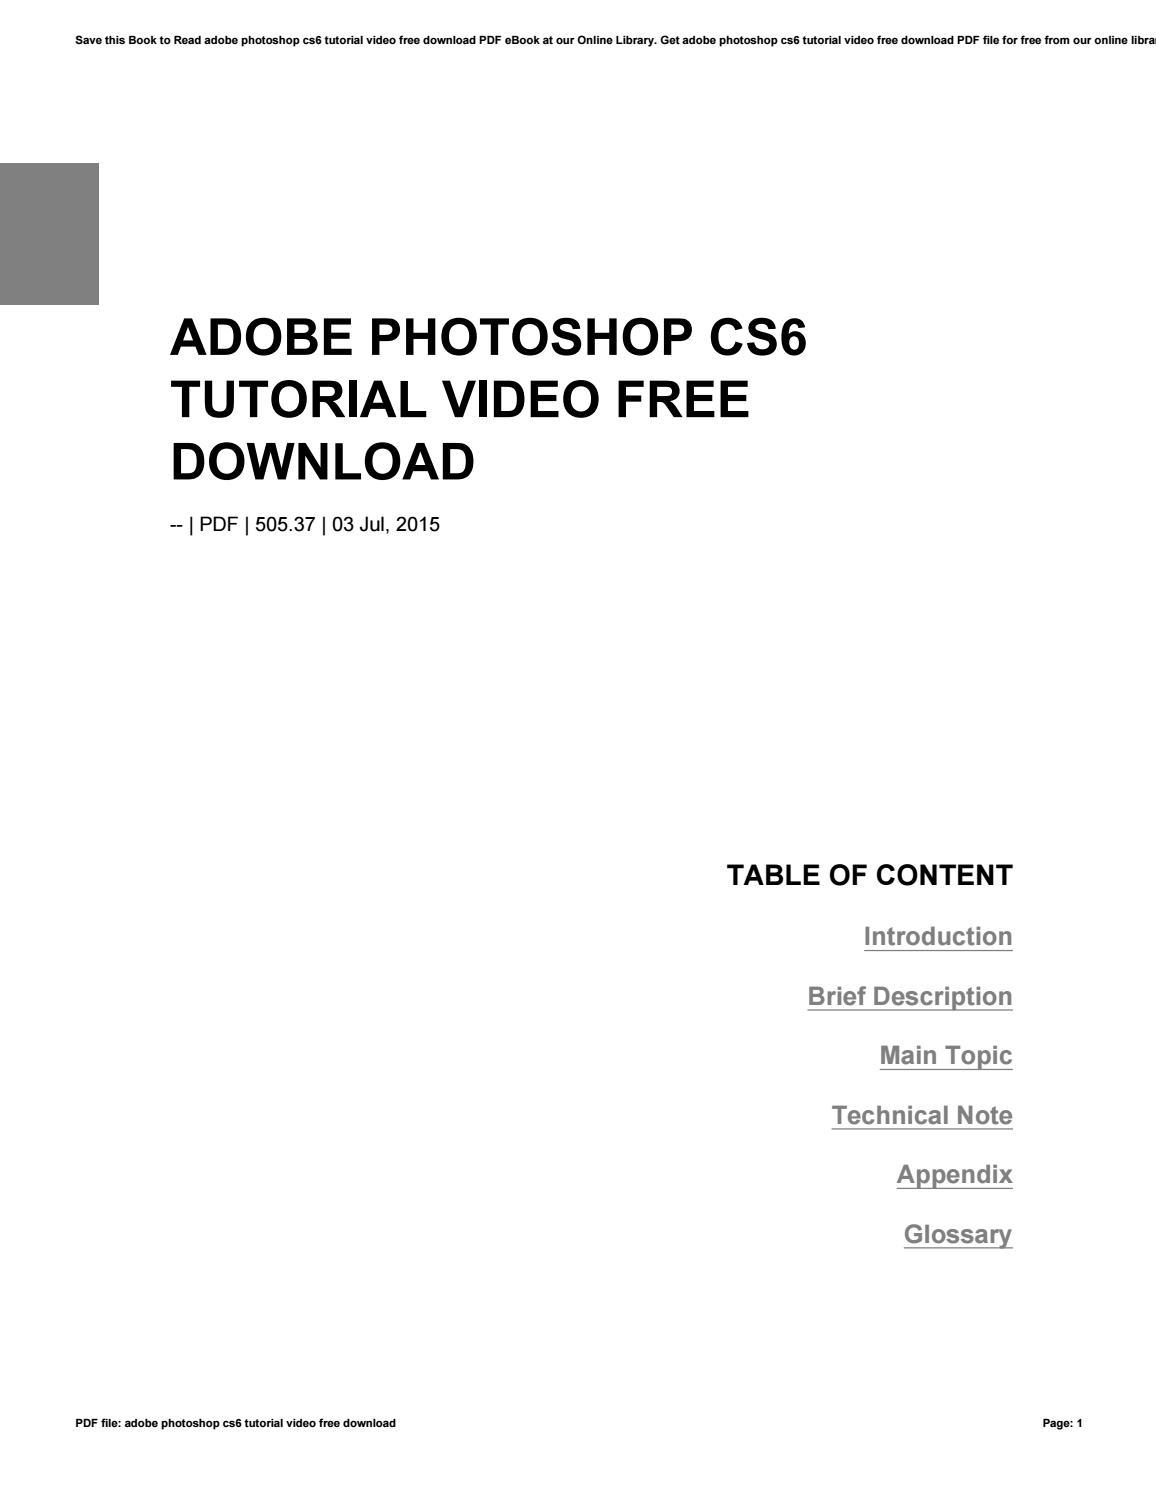 Adobe photoshop cs6 video tutorials youtube.